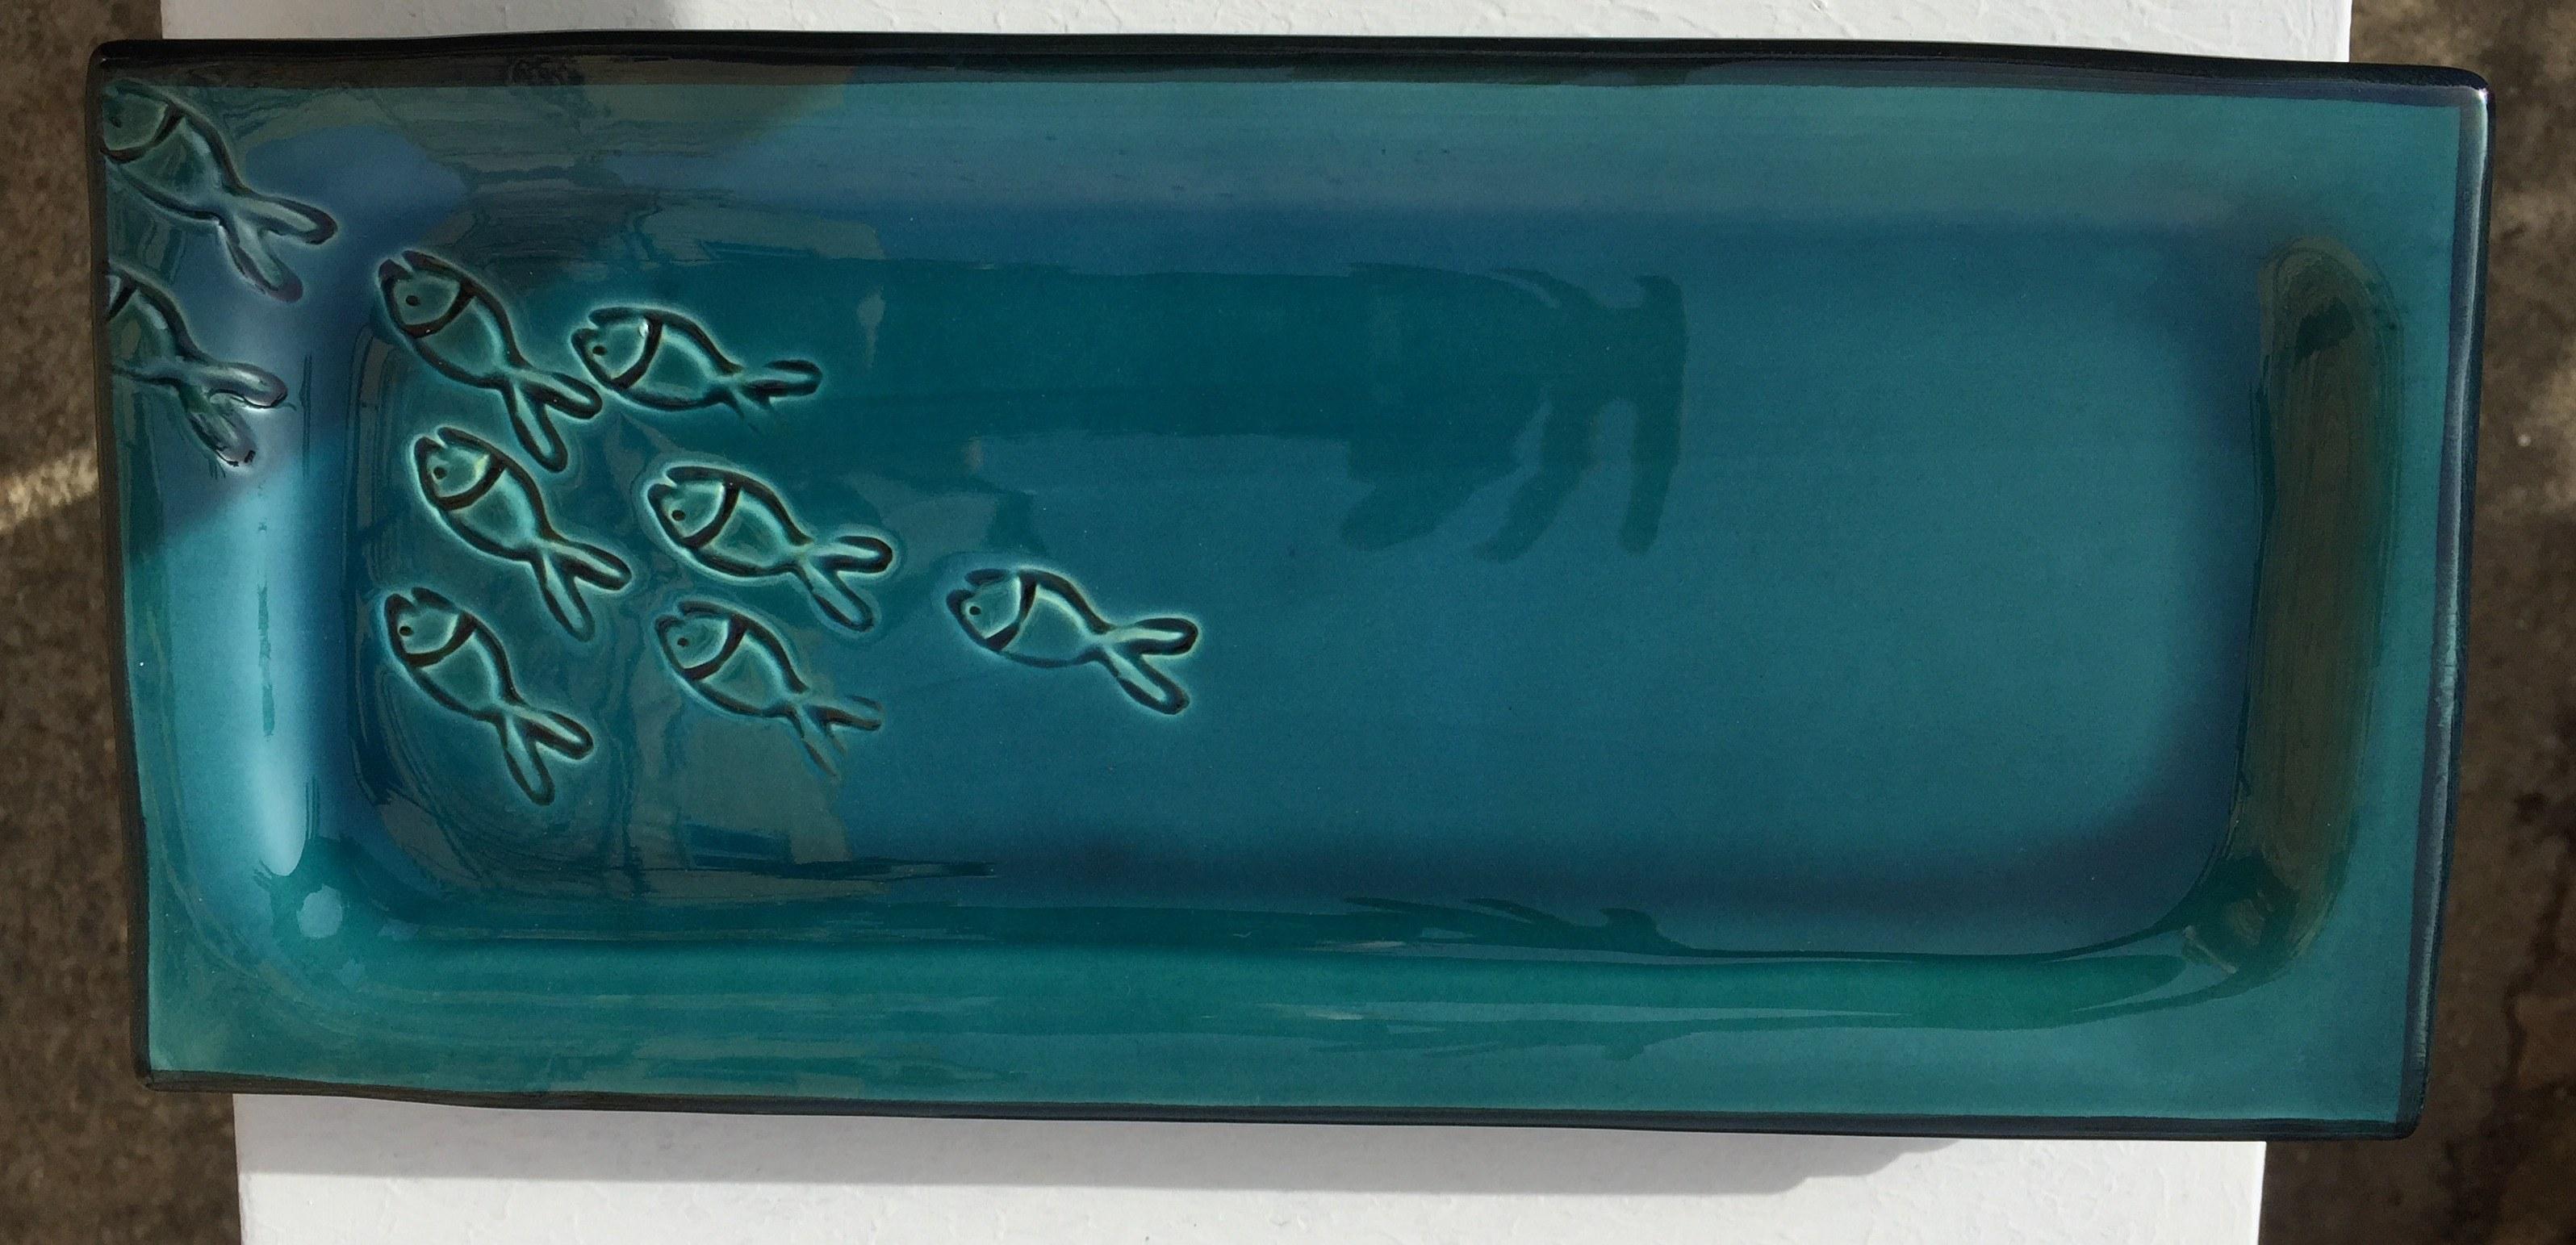 plat à cake faïence bleu décor poissons